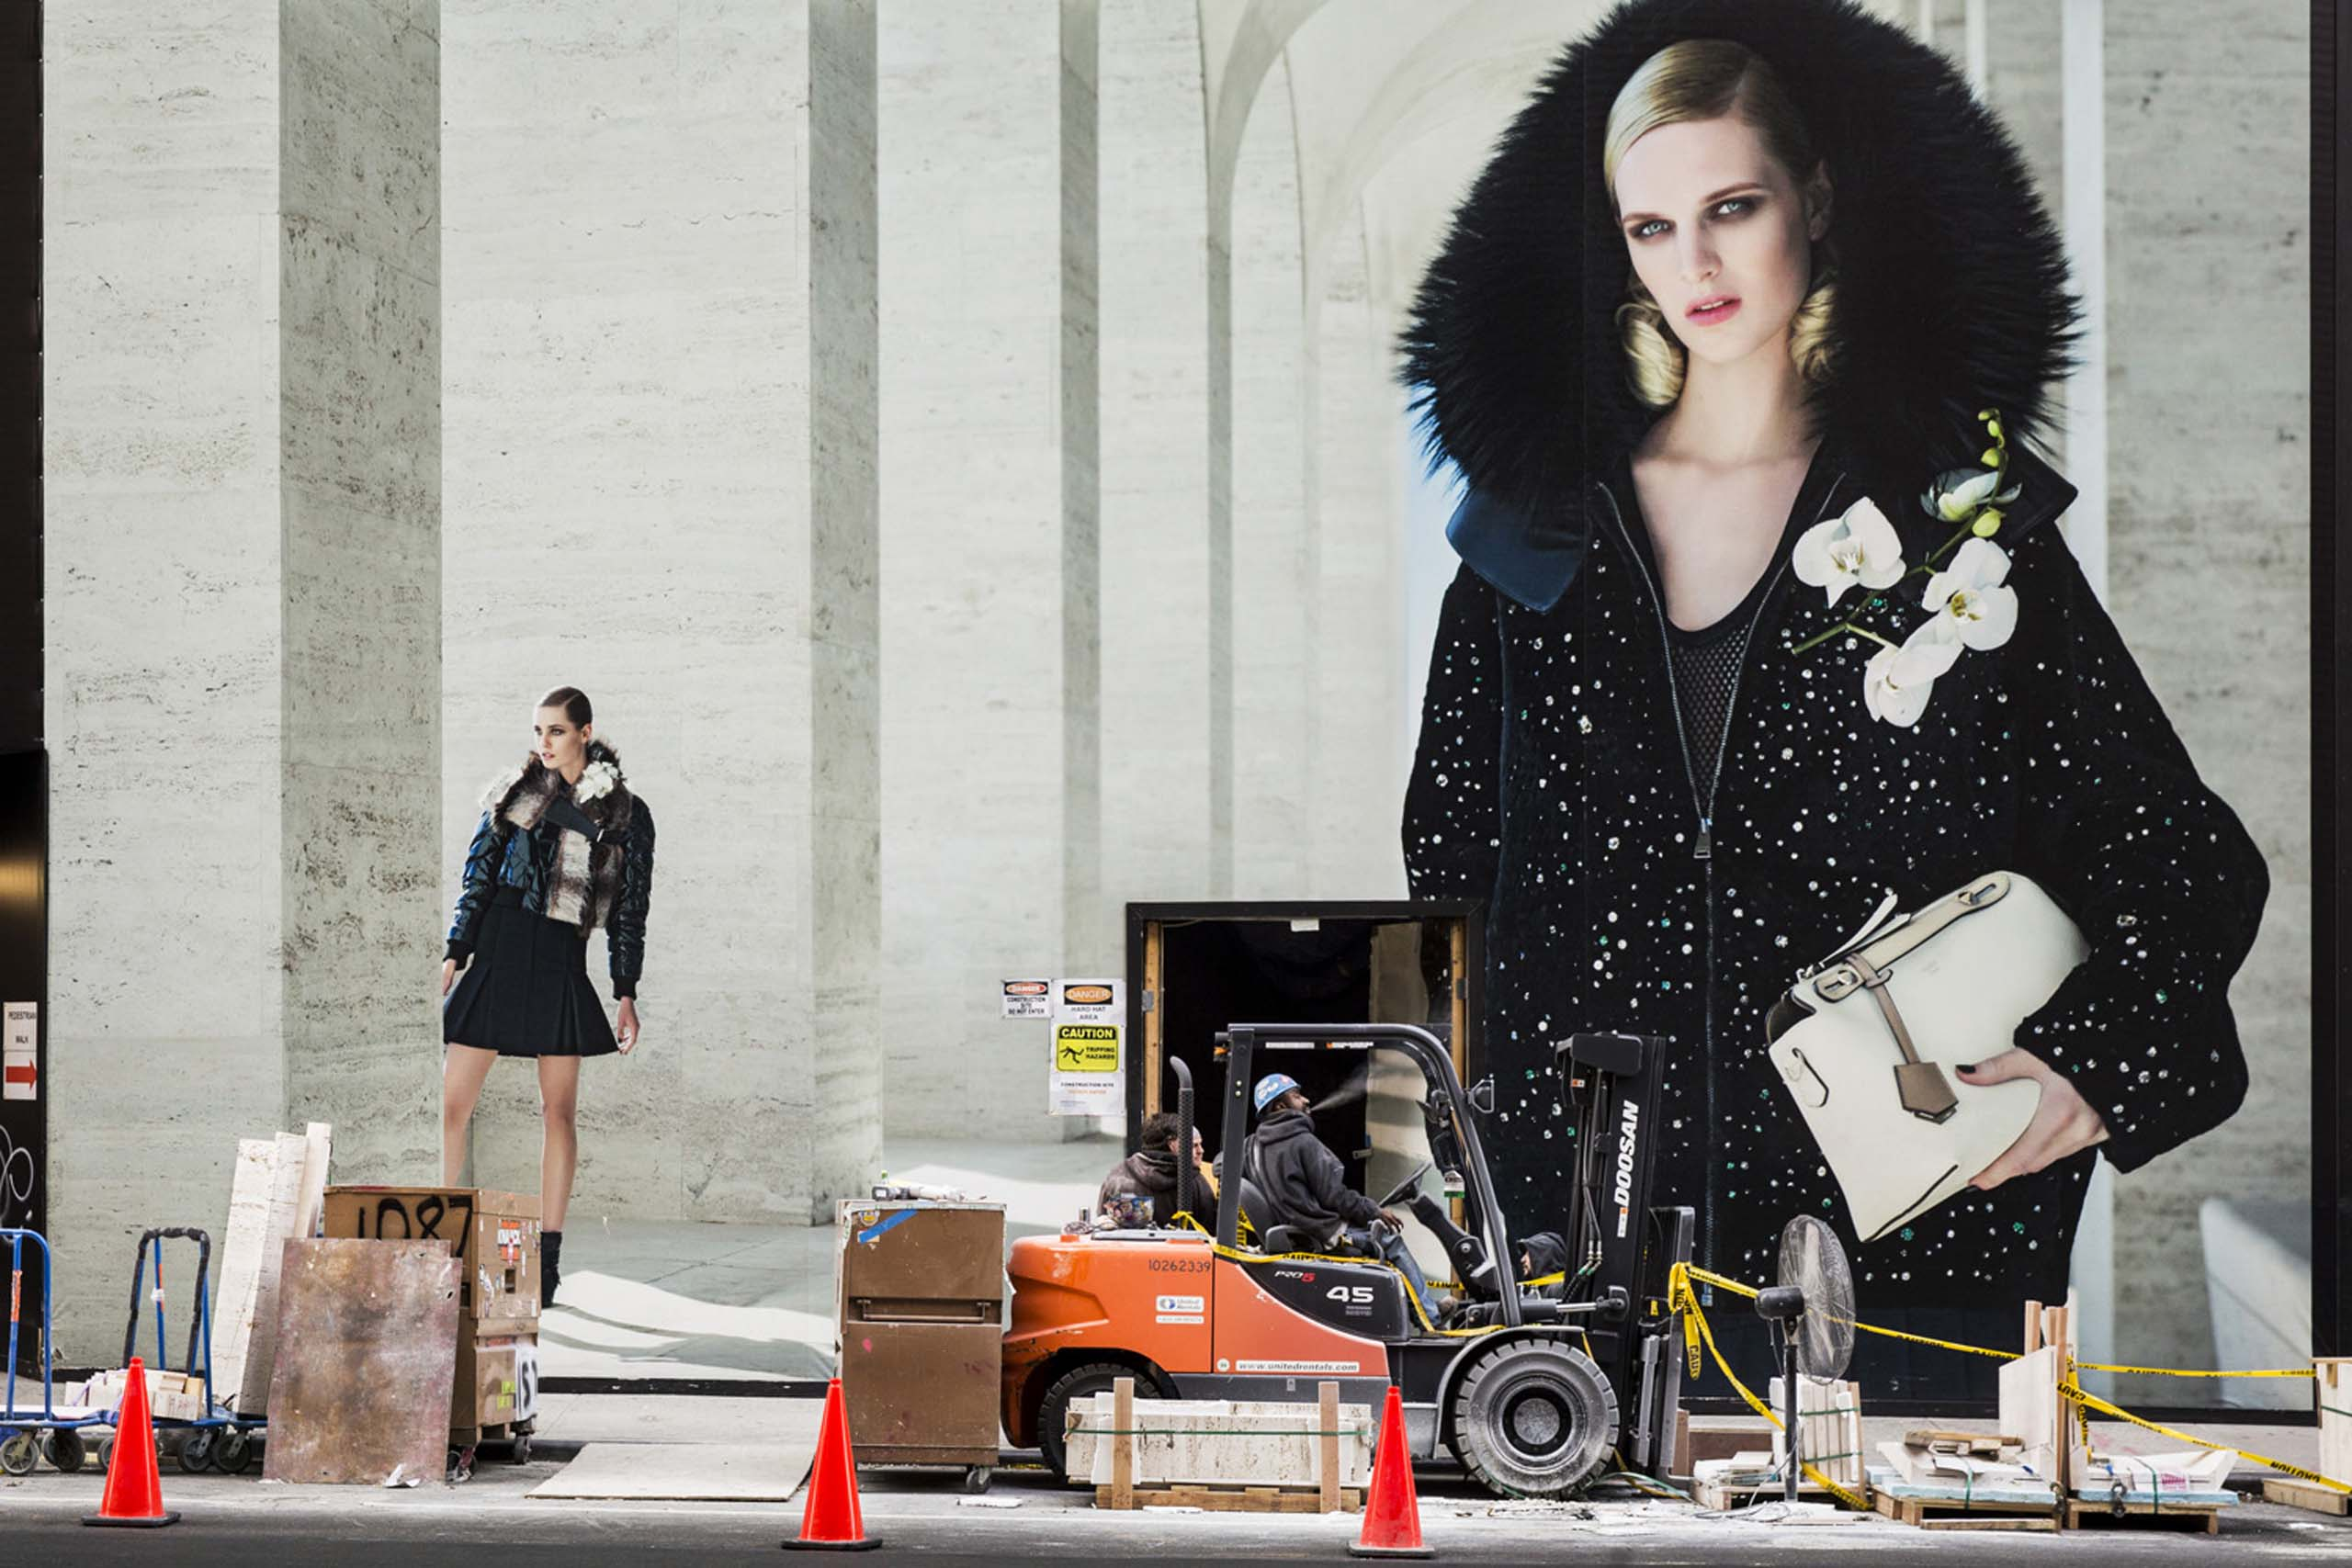 A construction worker enjoys a cigarette break next to a Fendi billboard on Madison Avenue, New York, Nov. 09, 2014.